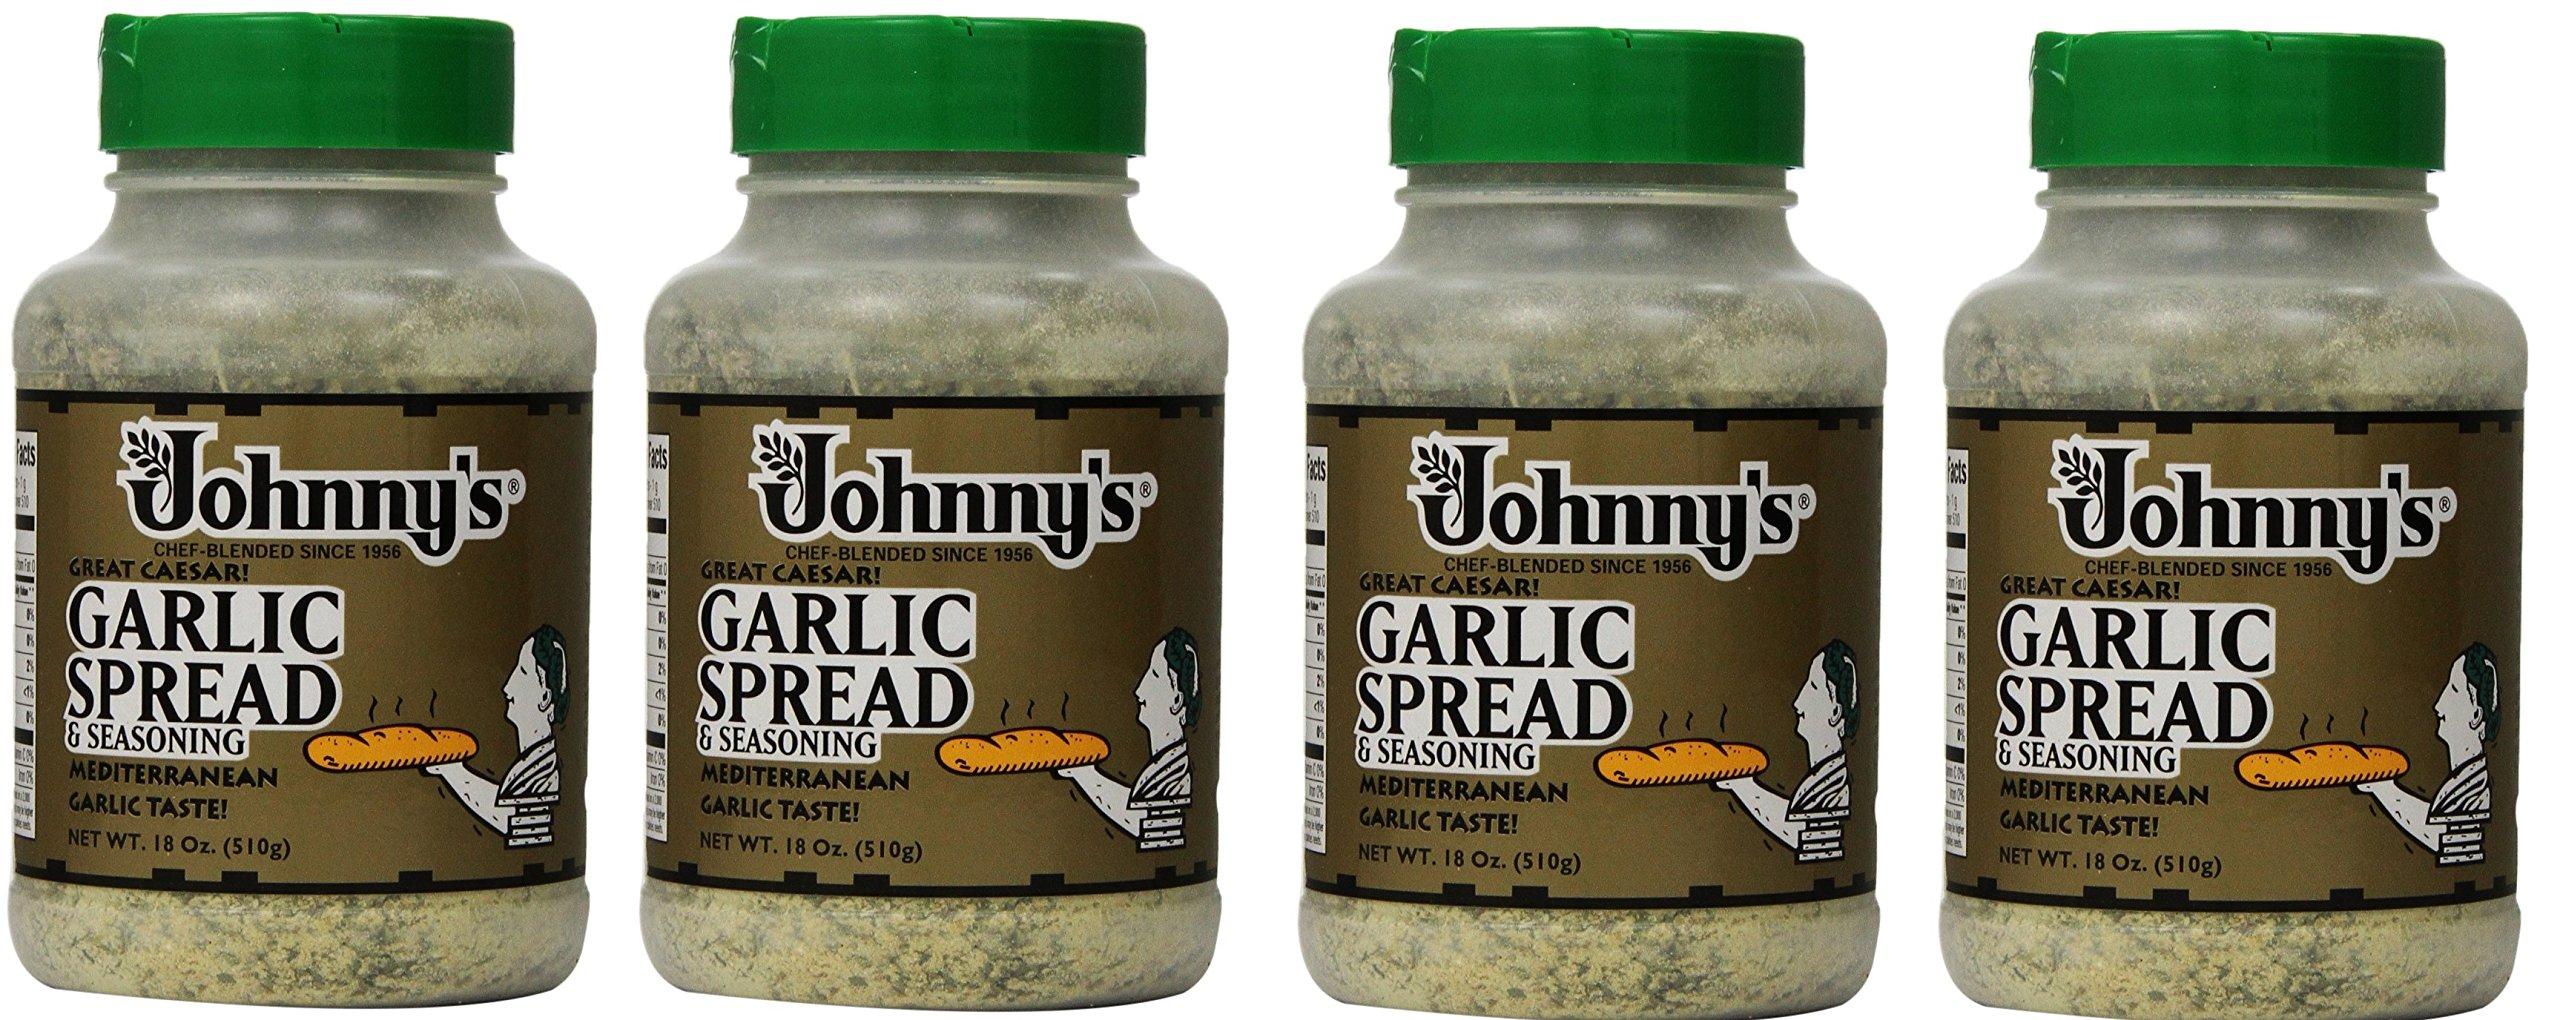 Johnnys Garlic Spread and Seasoning XjECar, 4Pack (18 Ounce)